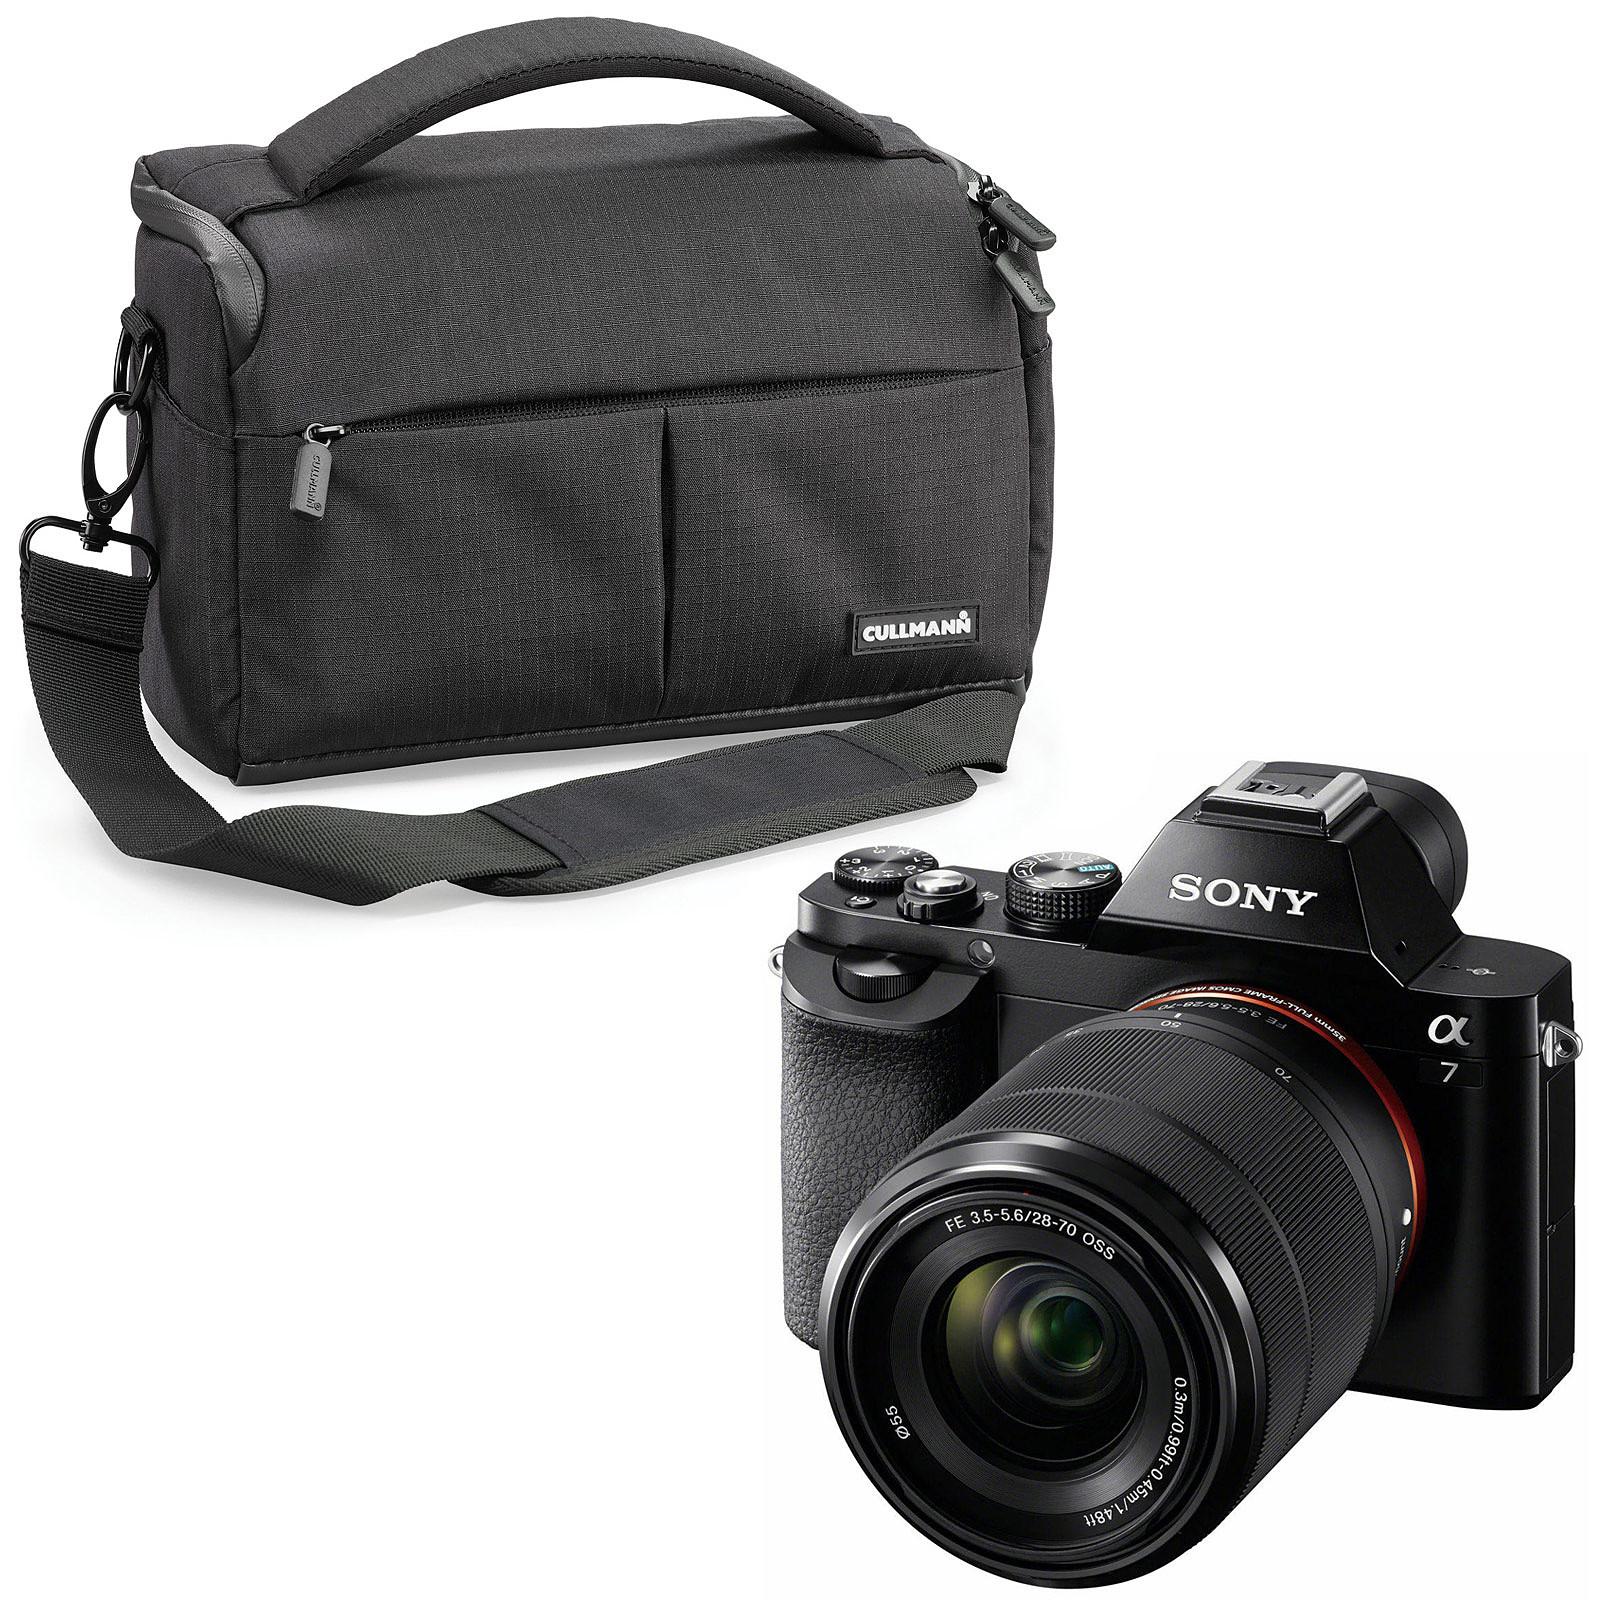 Sony Alpha 7 + Objectif 28-70 mm + Cullmann Malaga Maxima 70 Noir